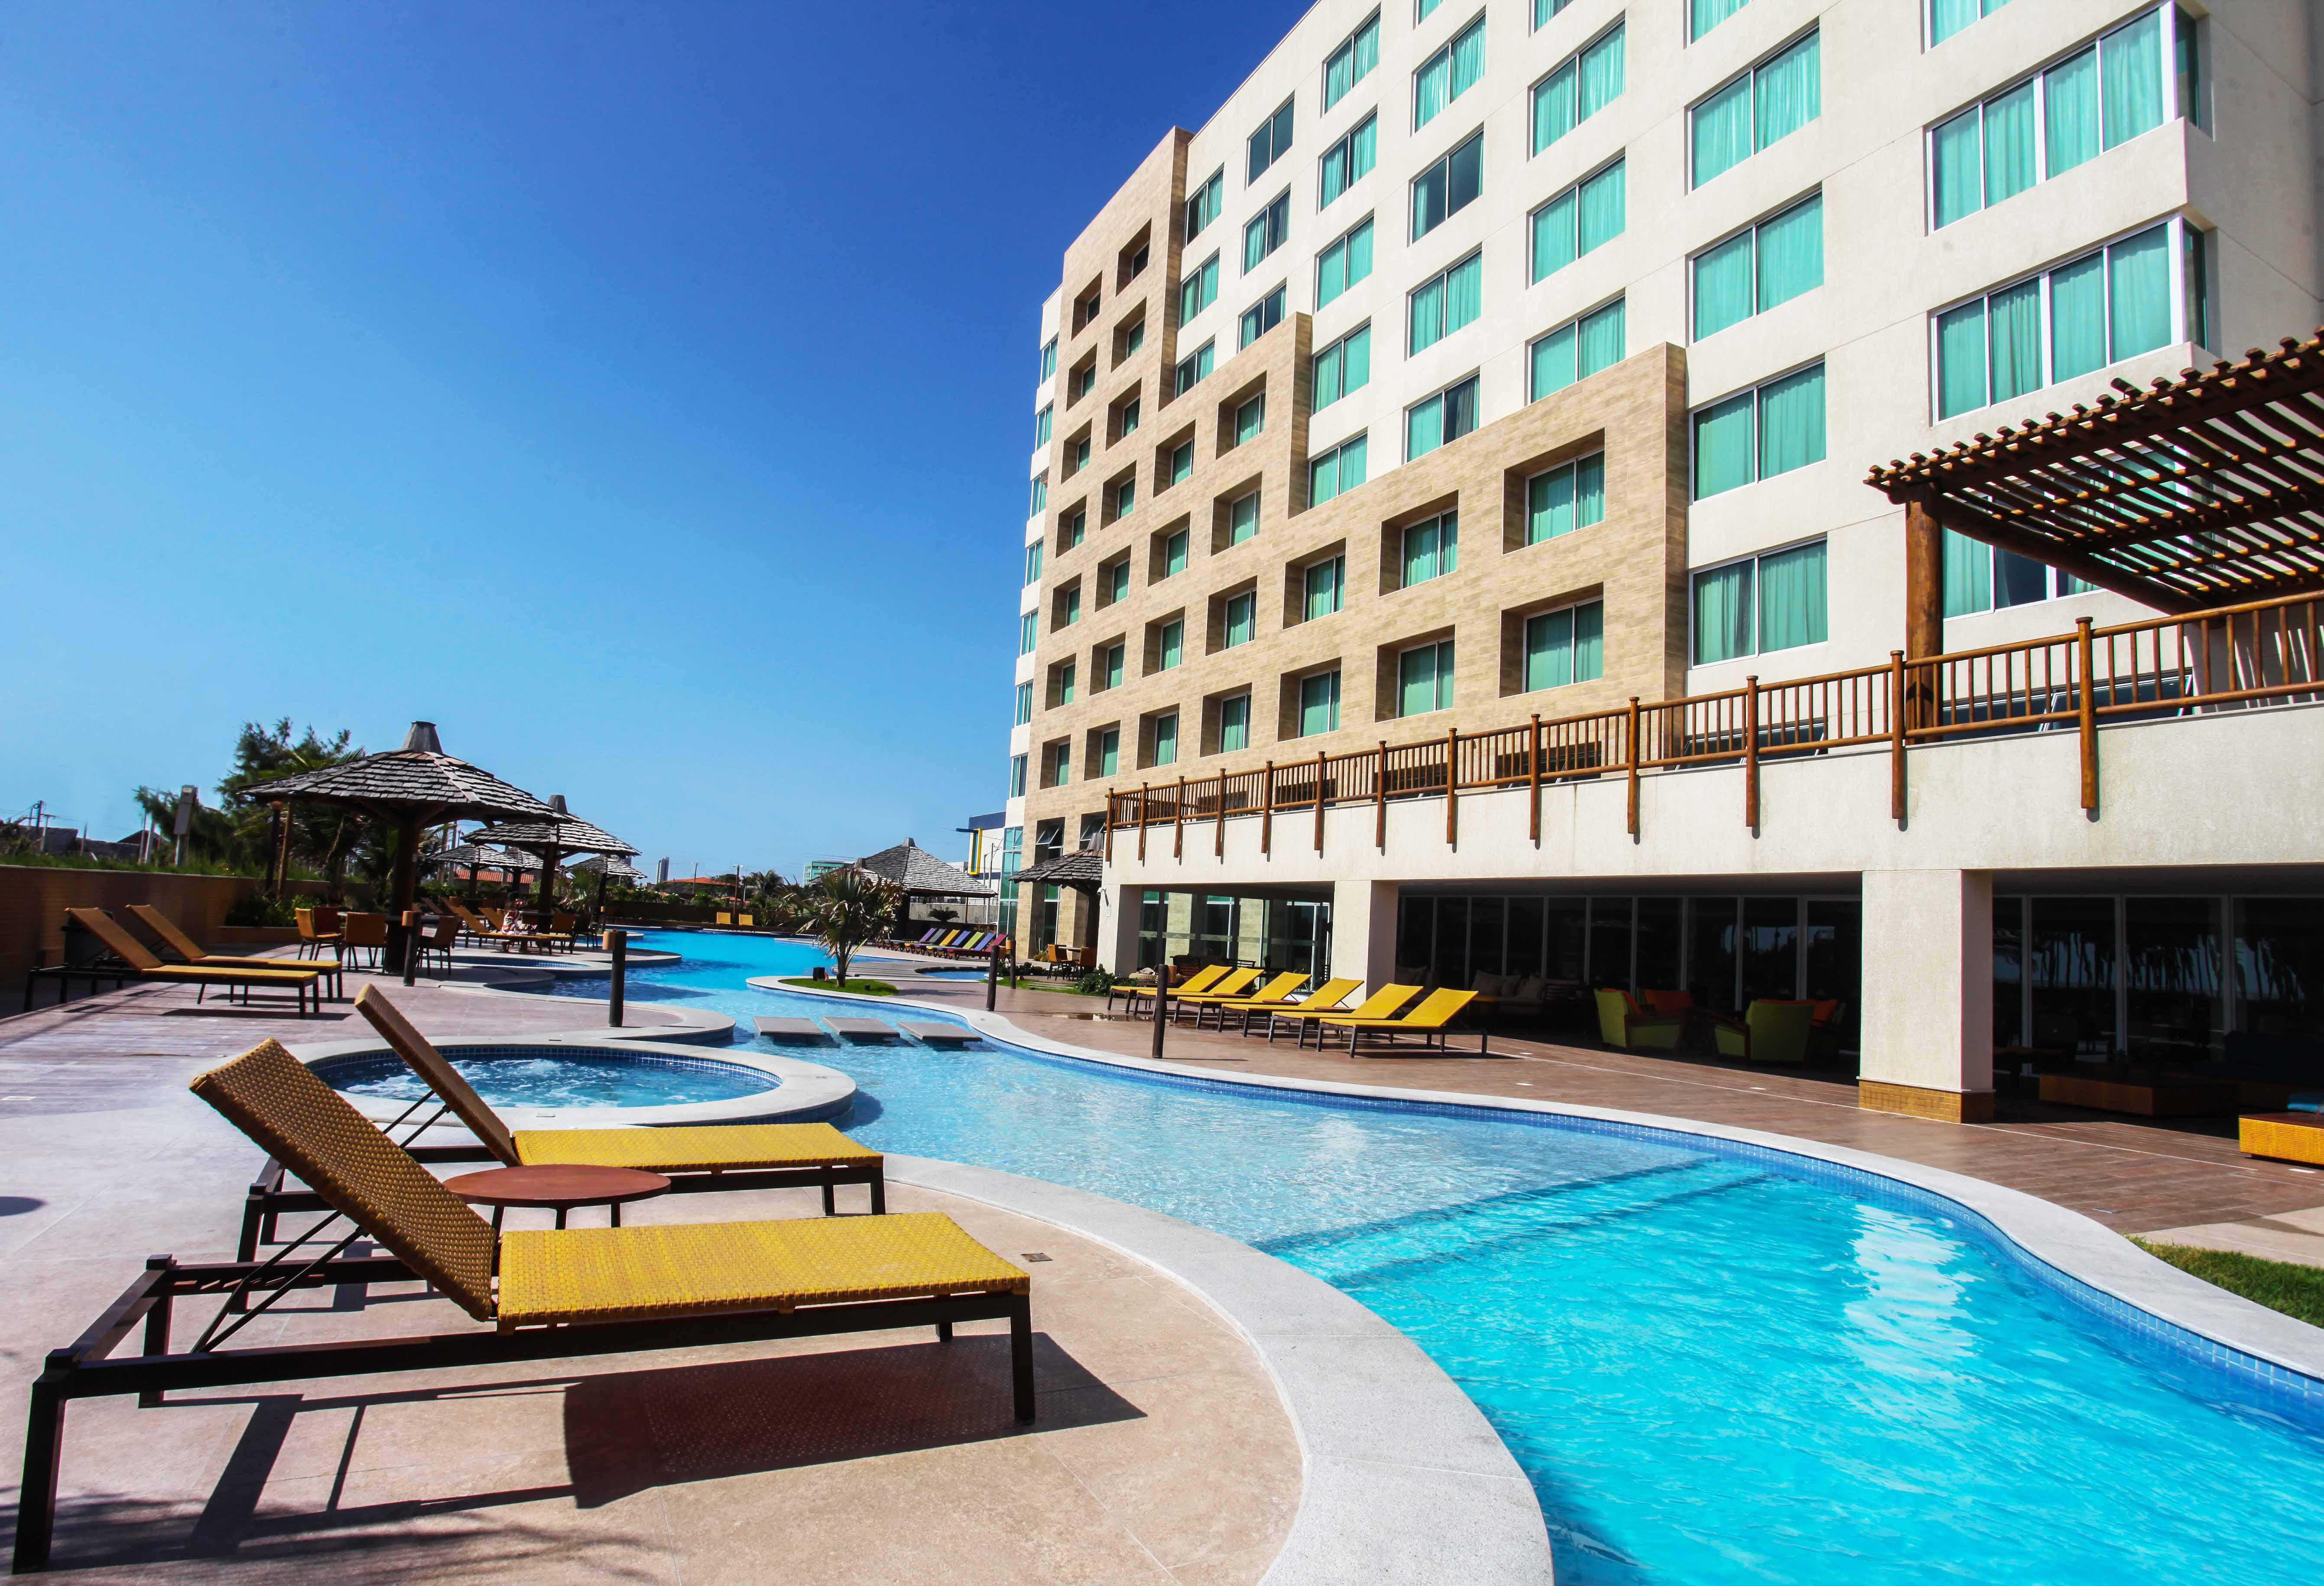 Hotel na beira mar da praia do Futuro